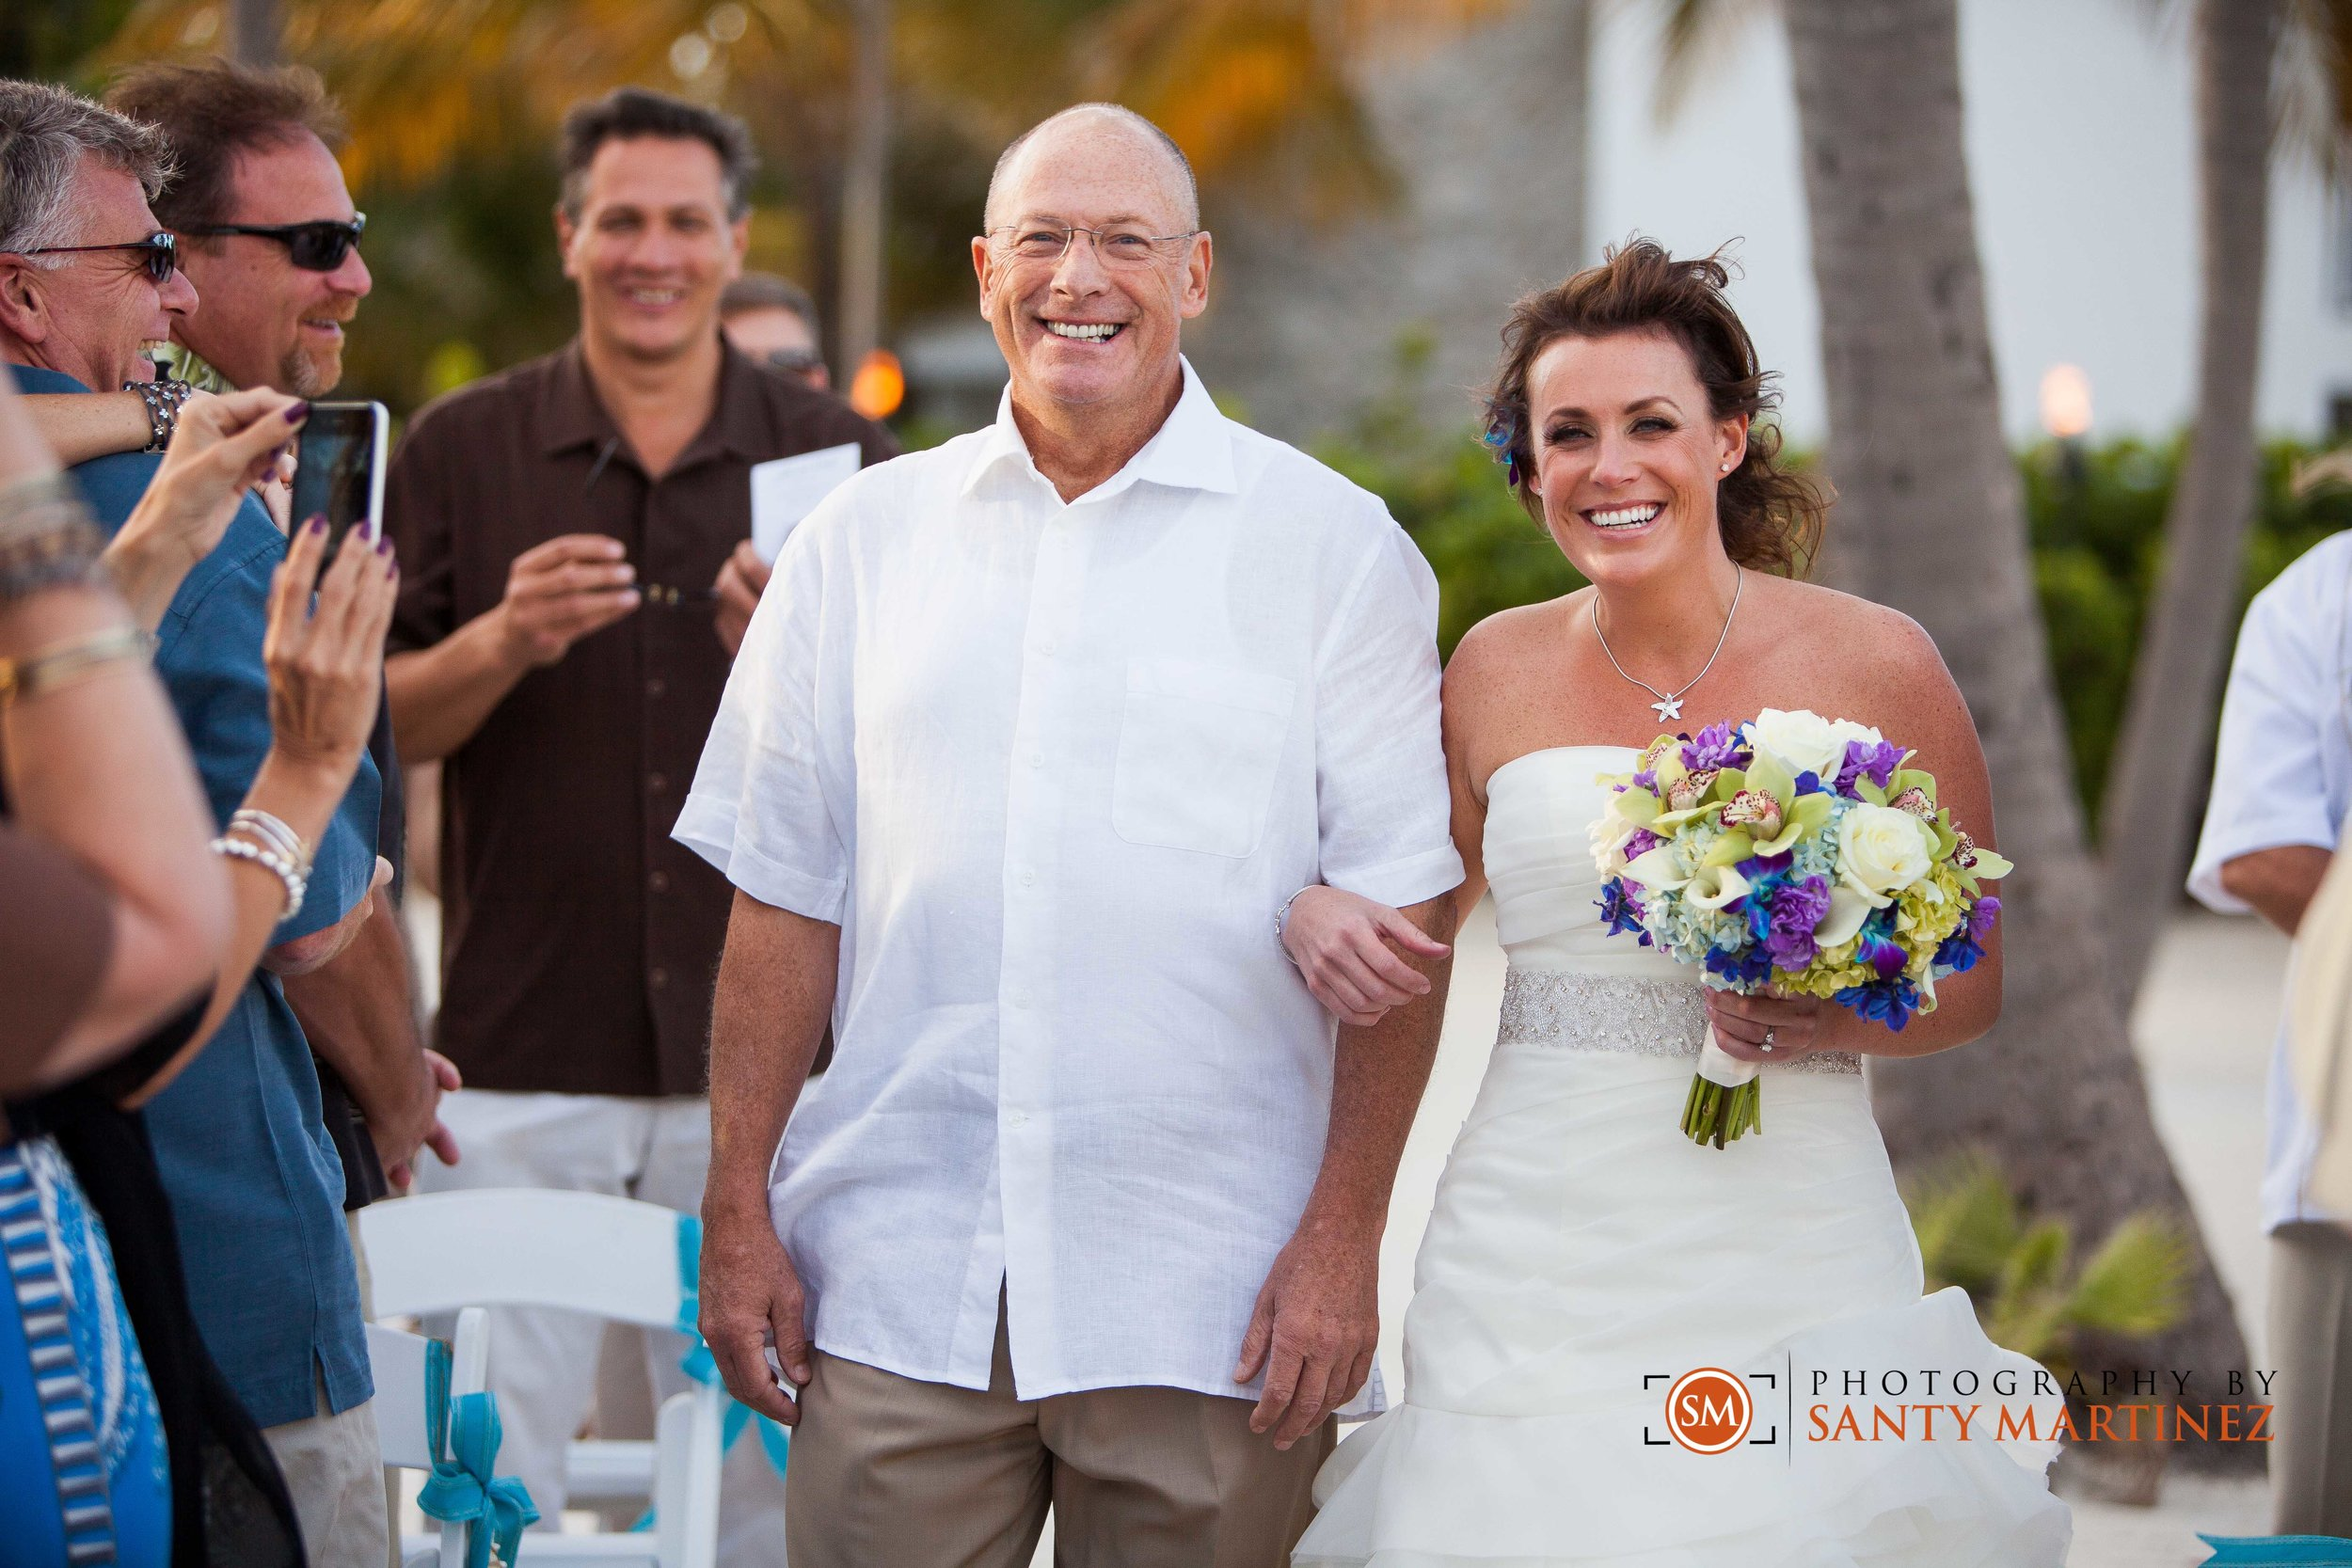 Photography by Santy Martinez - Miami Wedding Photographer-031.jpg